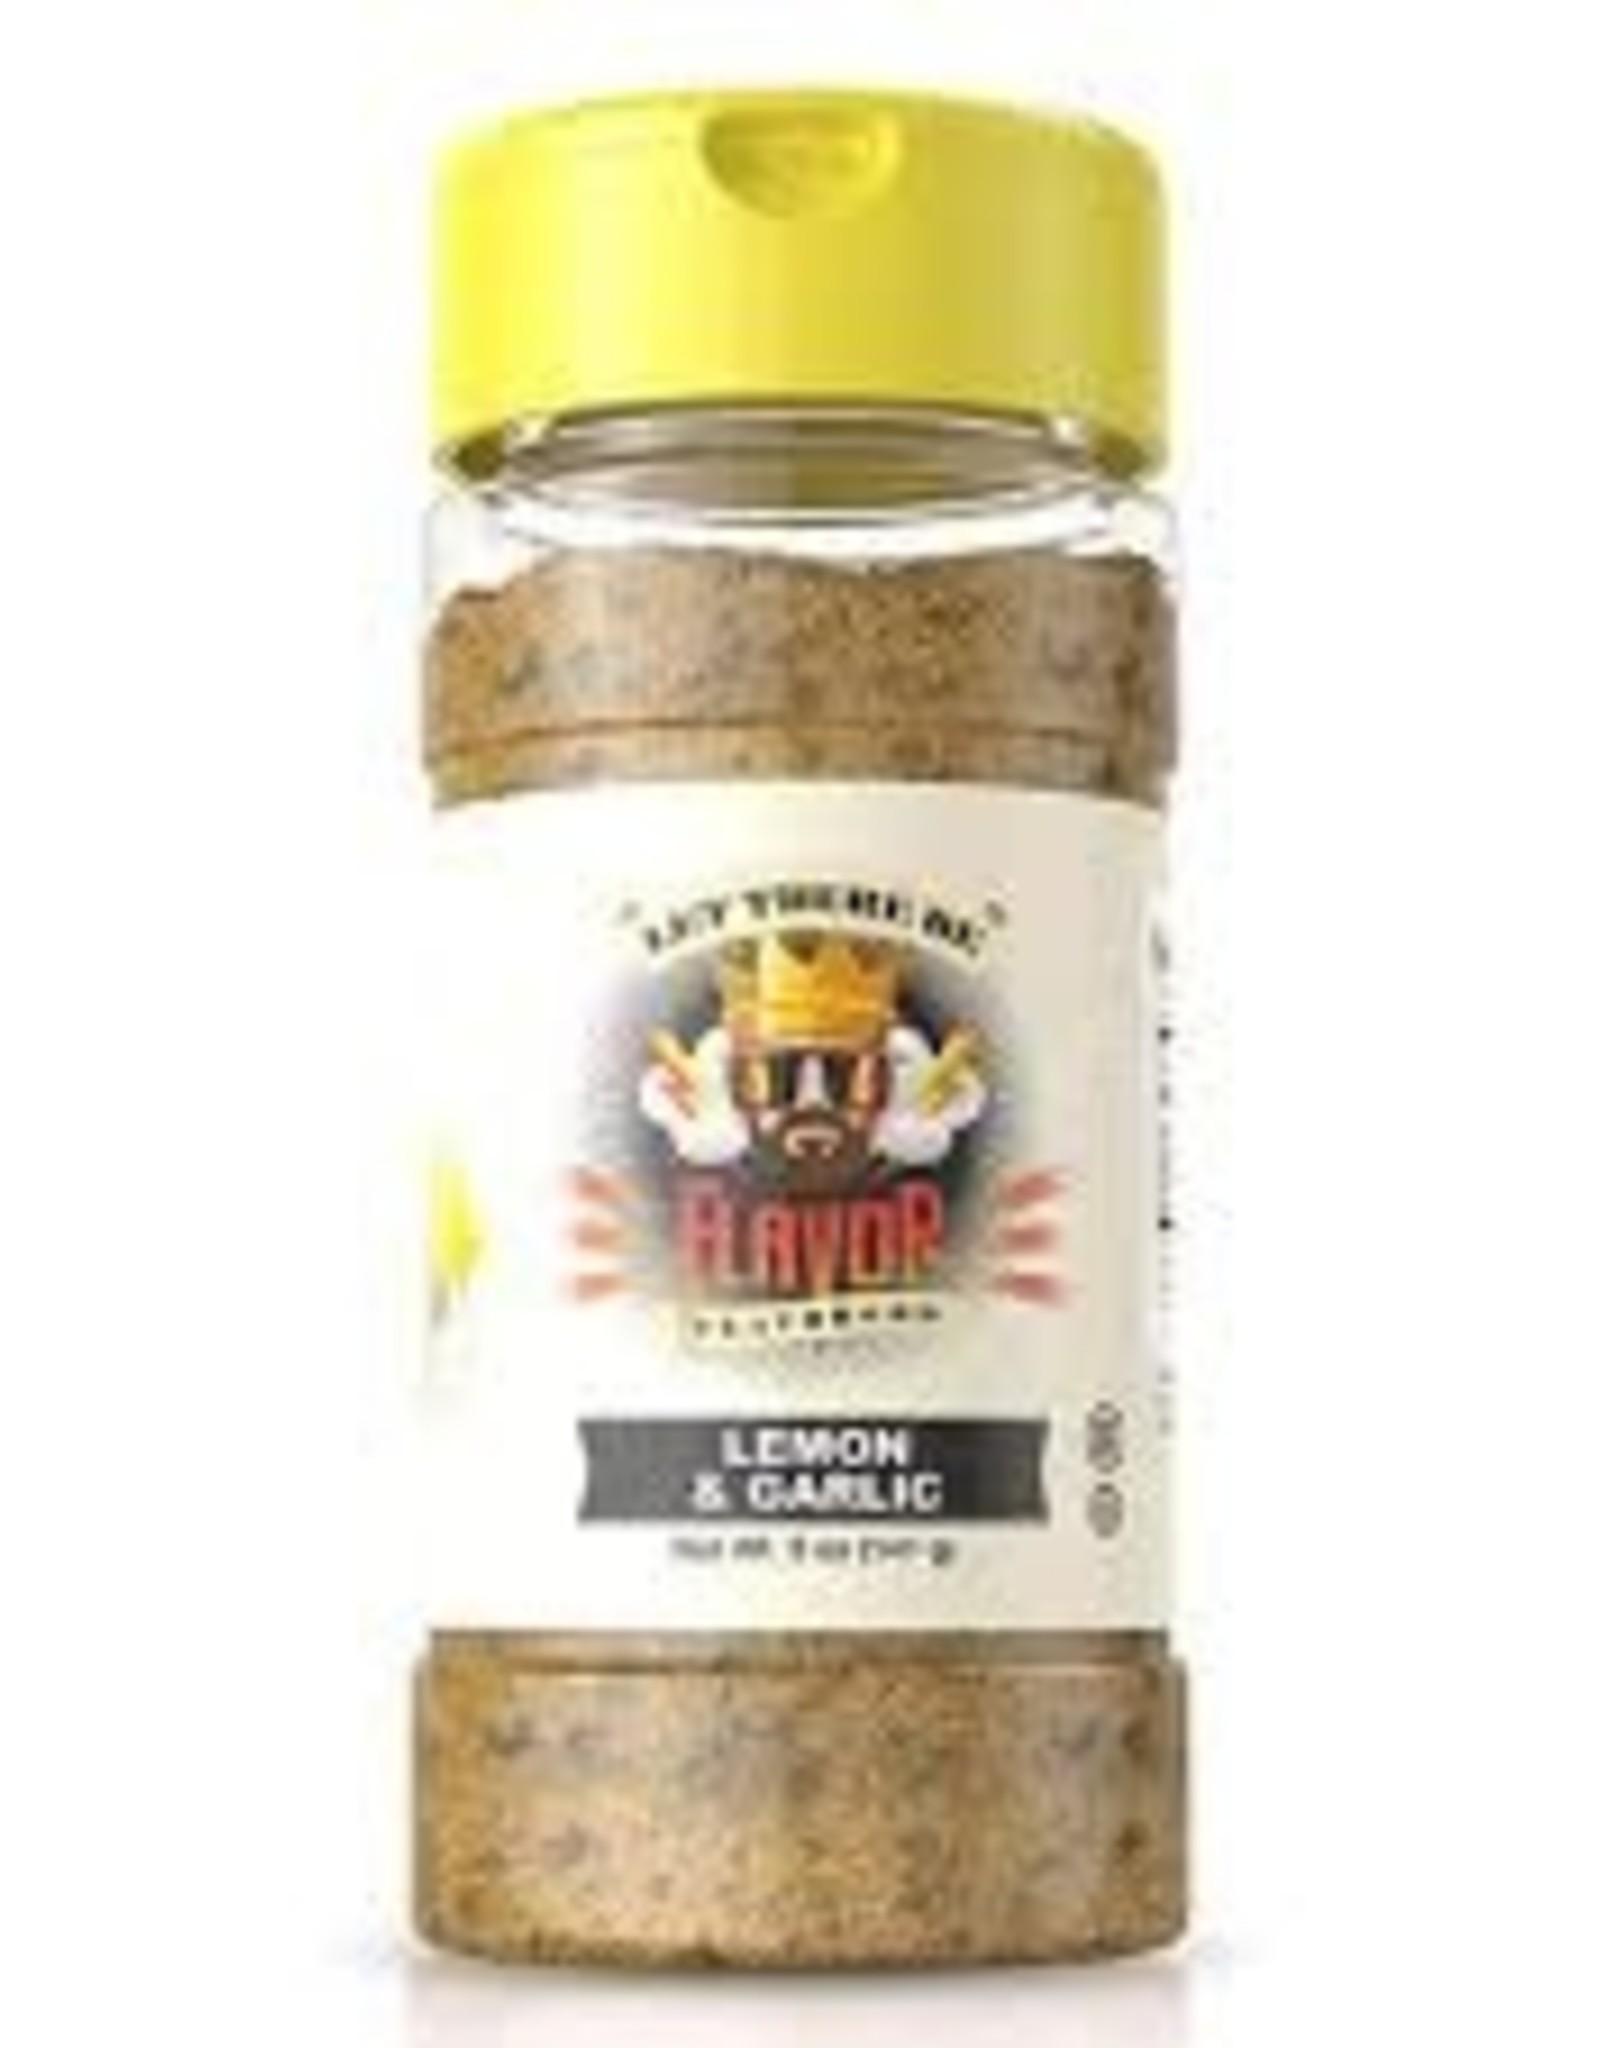 Flavor God Flavor God - Lemon & Garlic 5oz